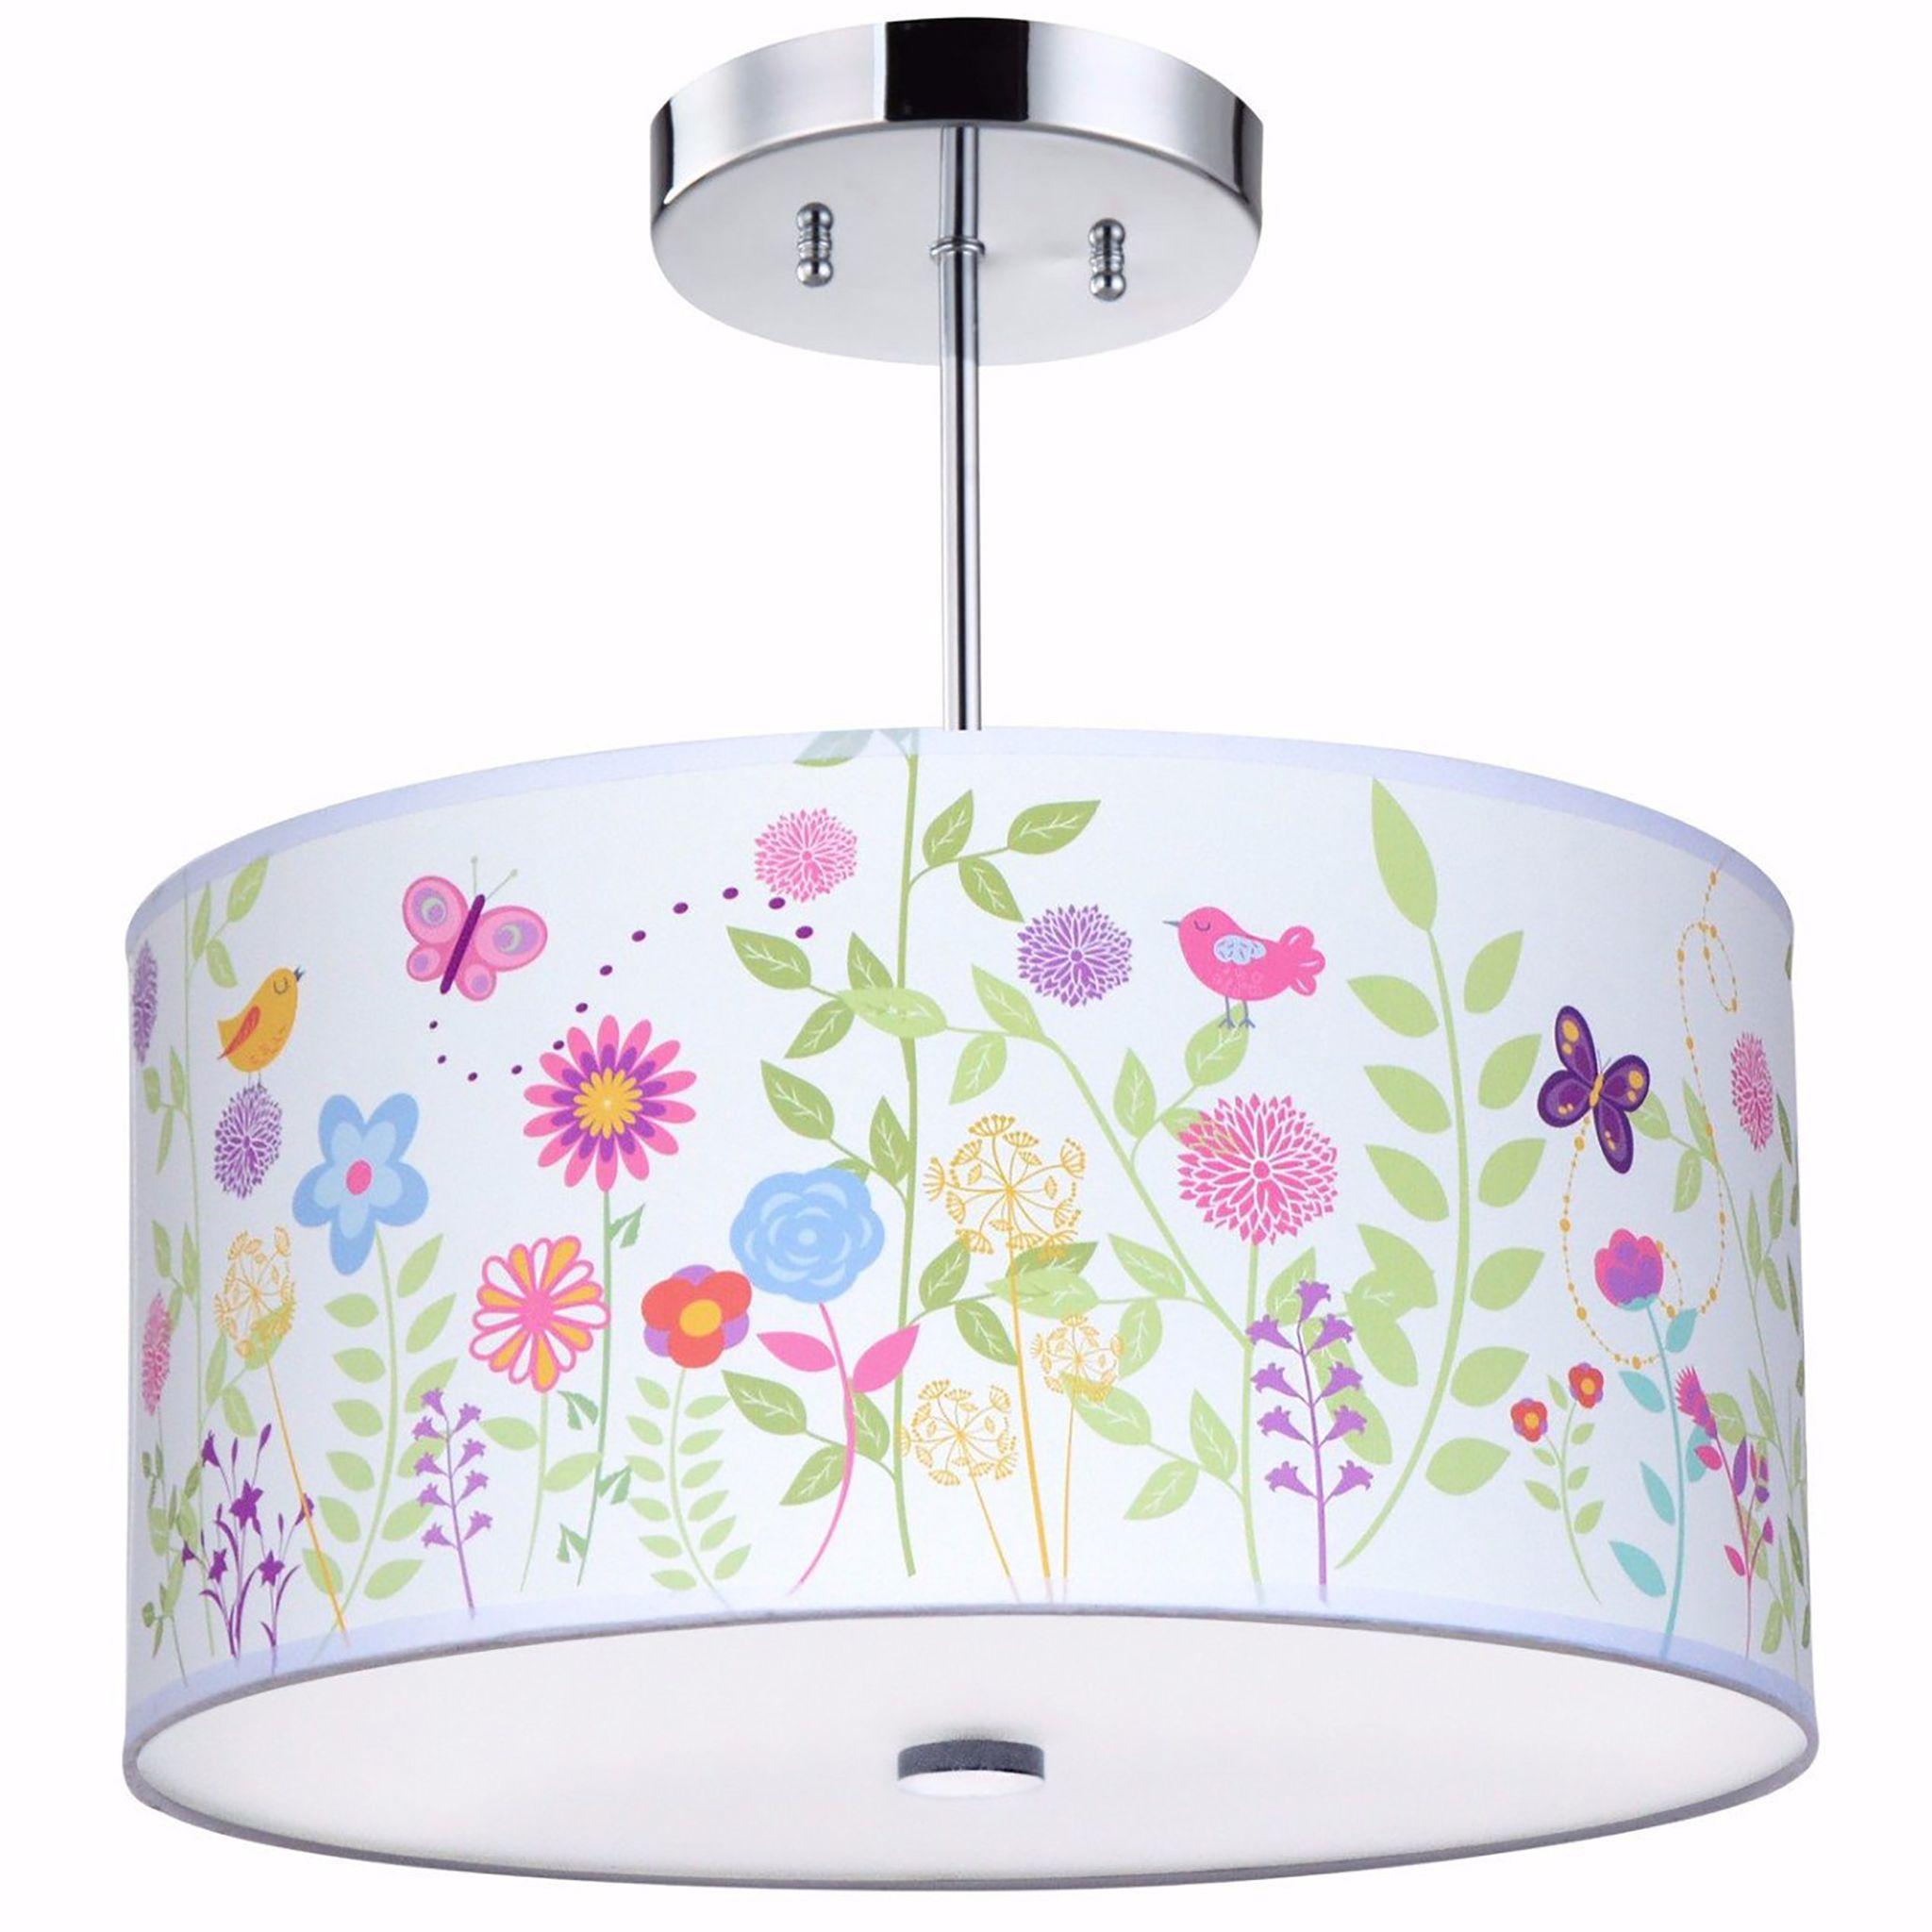 Flowers & Birdies Light Fixture, 3Light Light fixtures